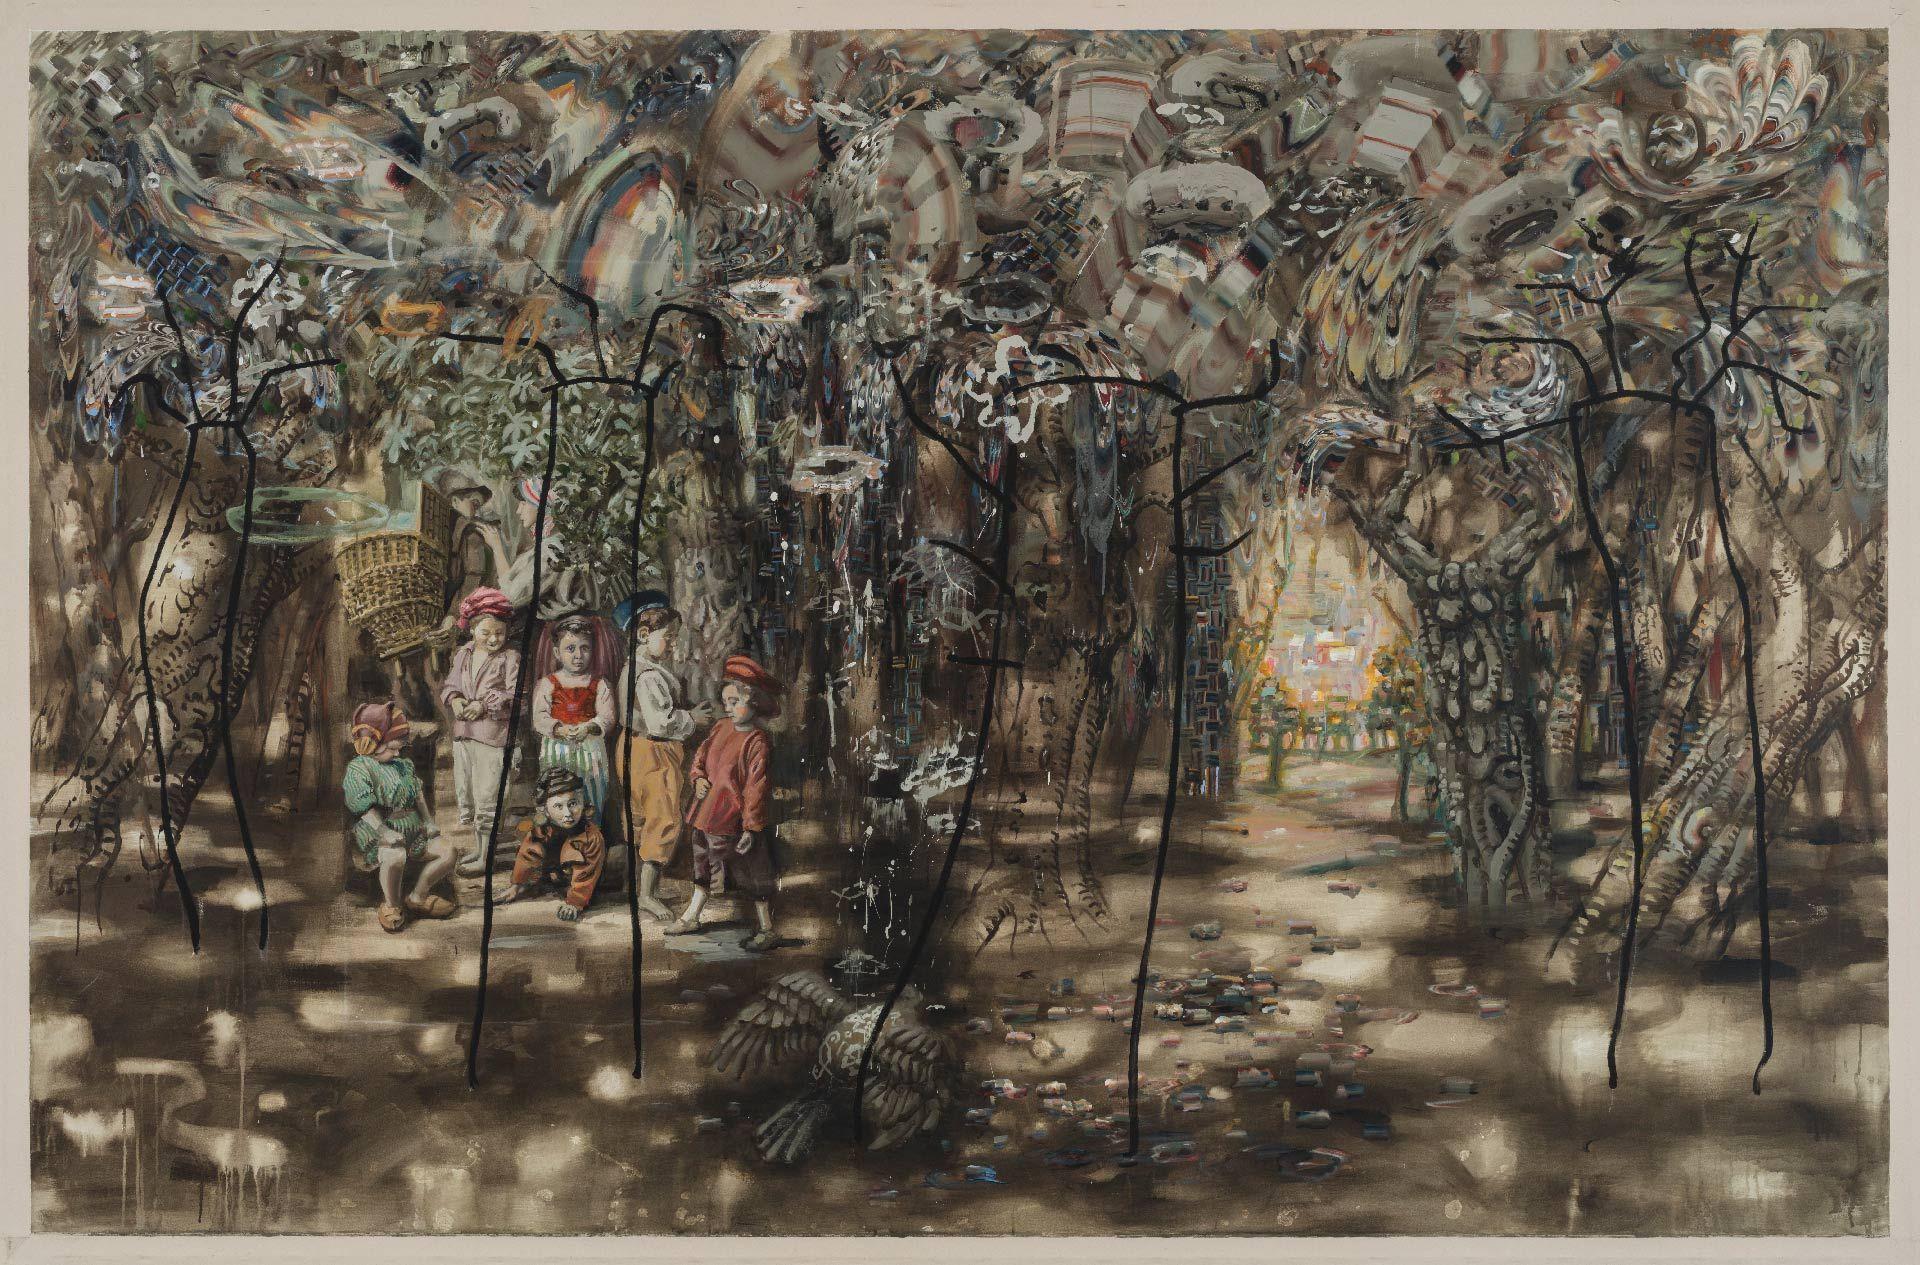 Carol Wainio (born in 1955), The Fall, 2015